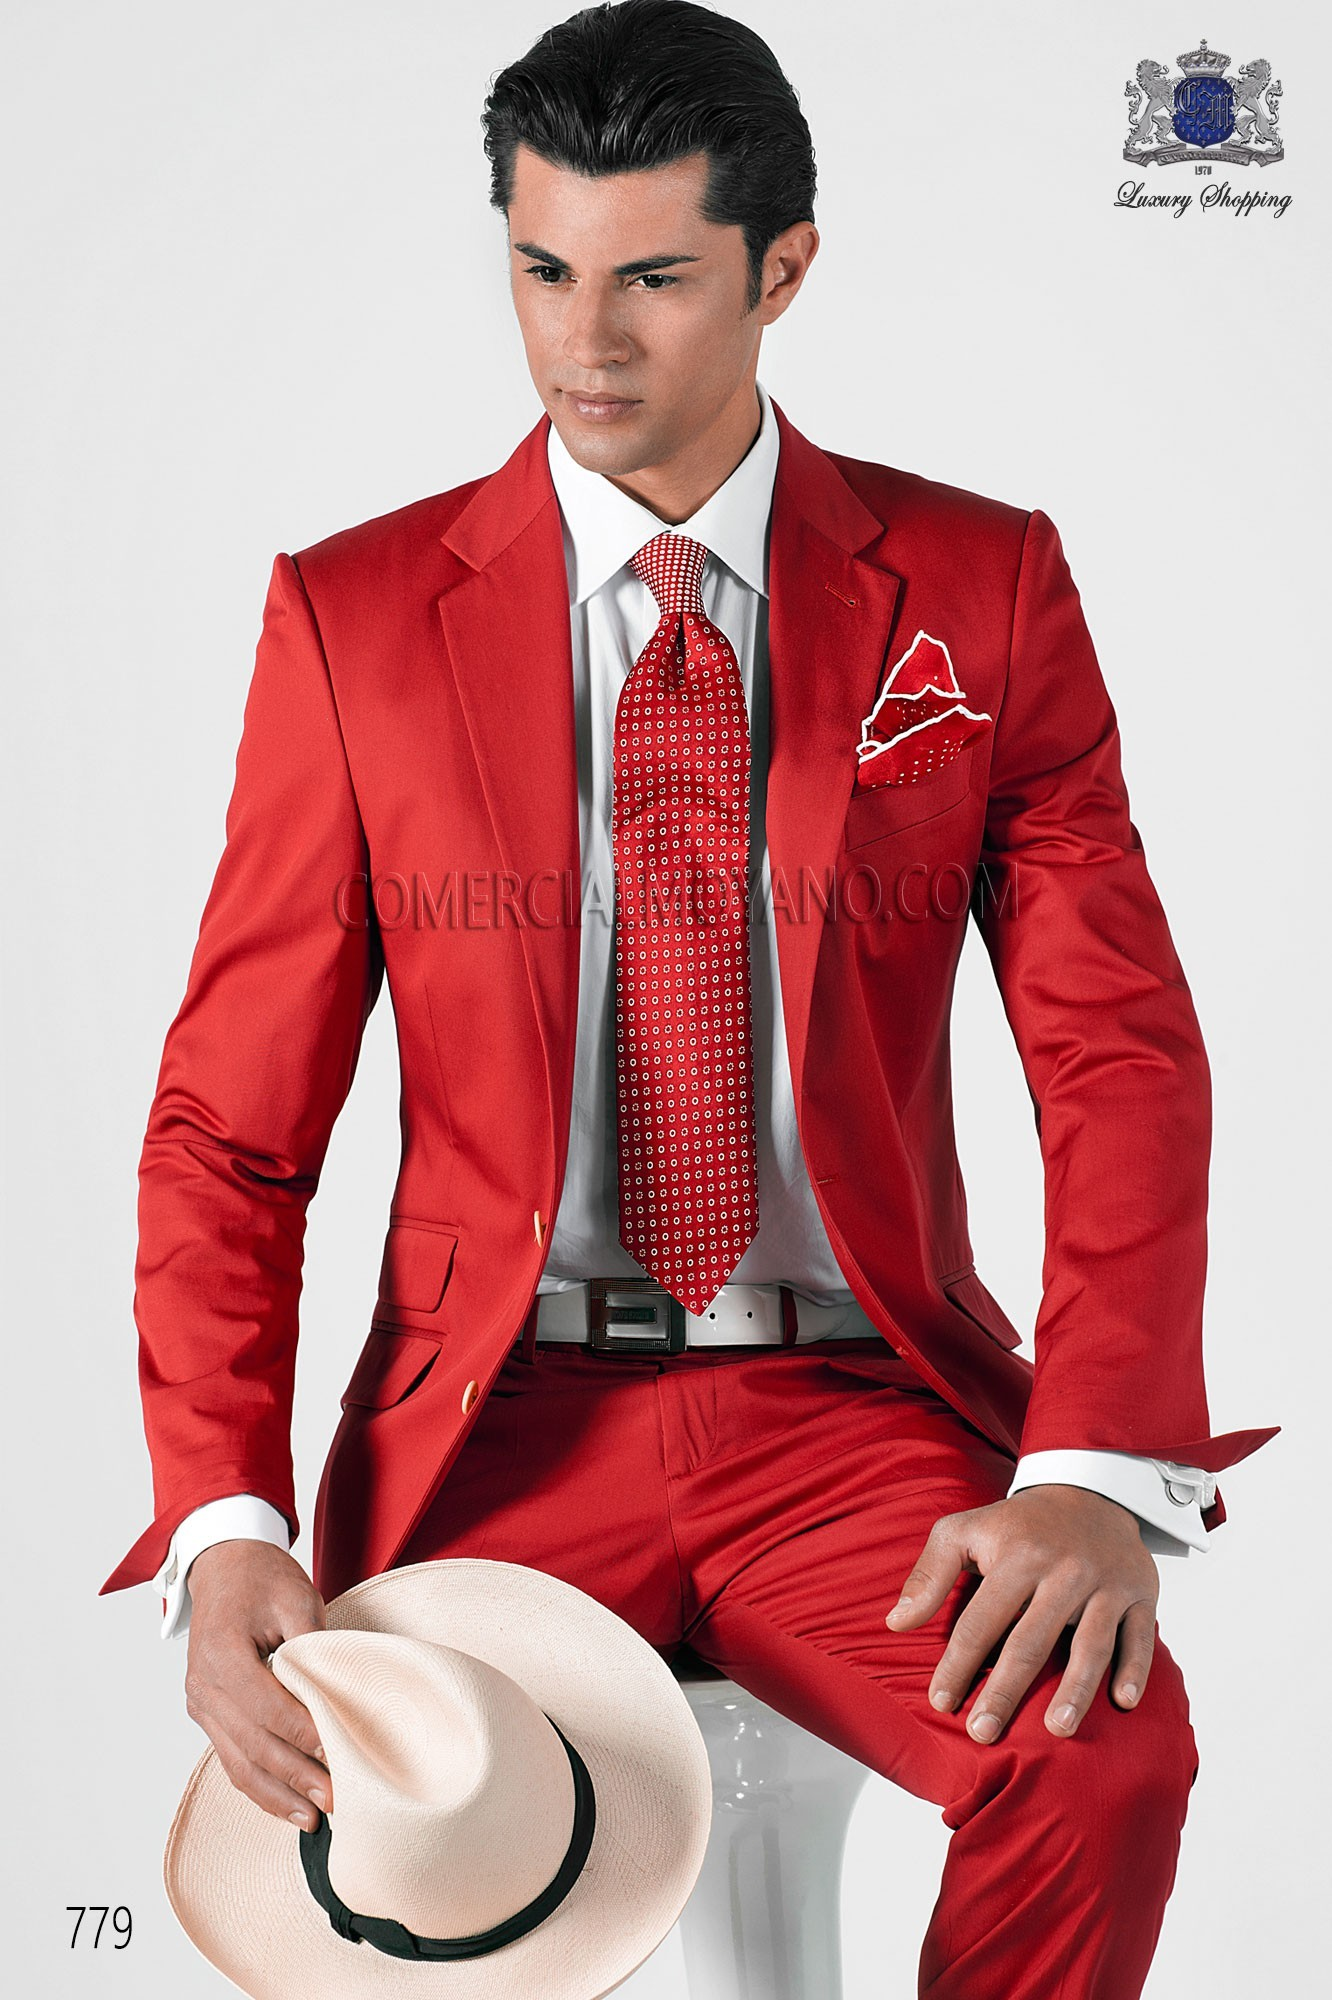 Traje de novio Hipster rojo modelo: 779 Ottavio Nuccio Gala colección Hipster 2017